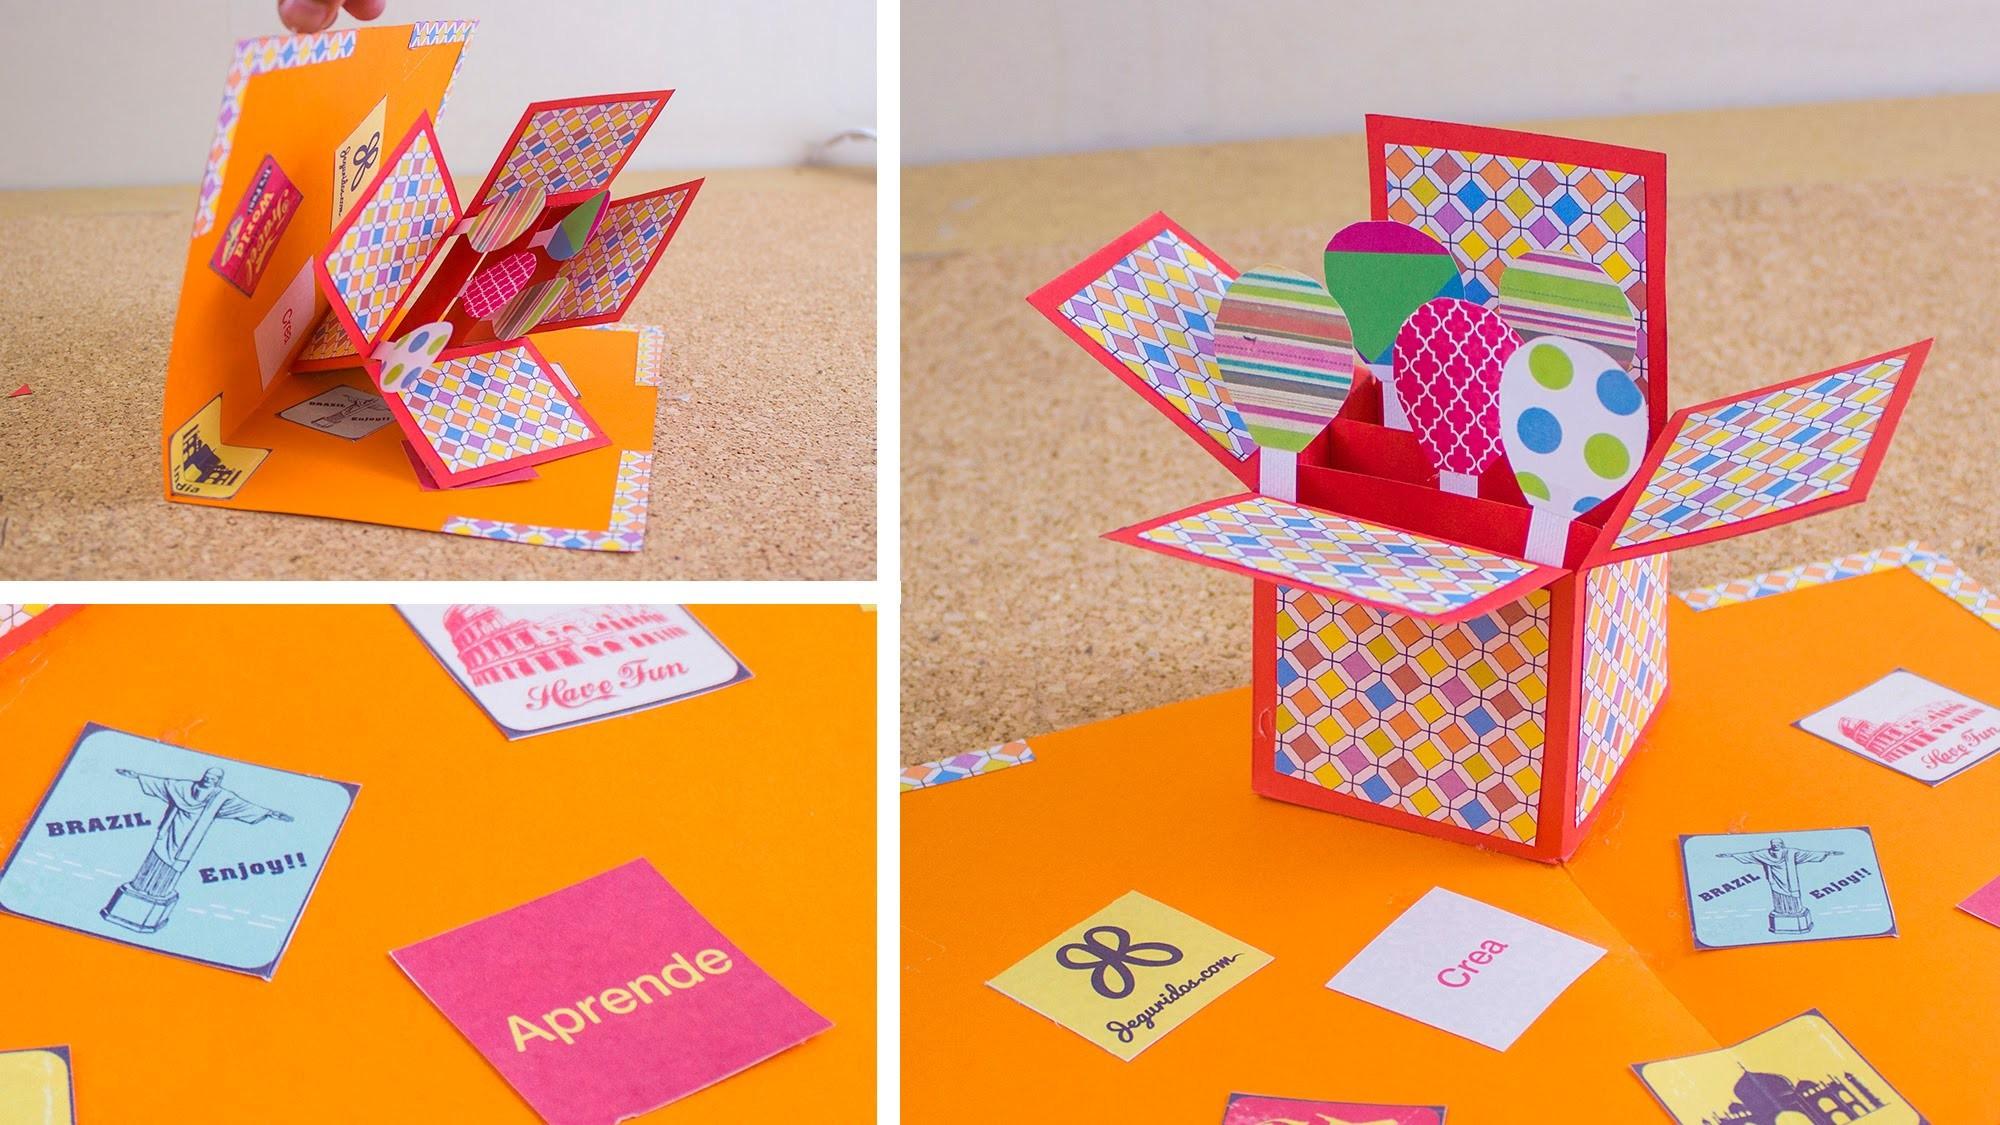 Tarjeta in pop up box jeguridos my crafts and diy projects - Como realizar tarjetas navidenas ...